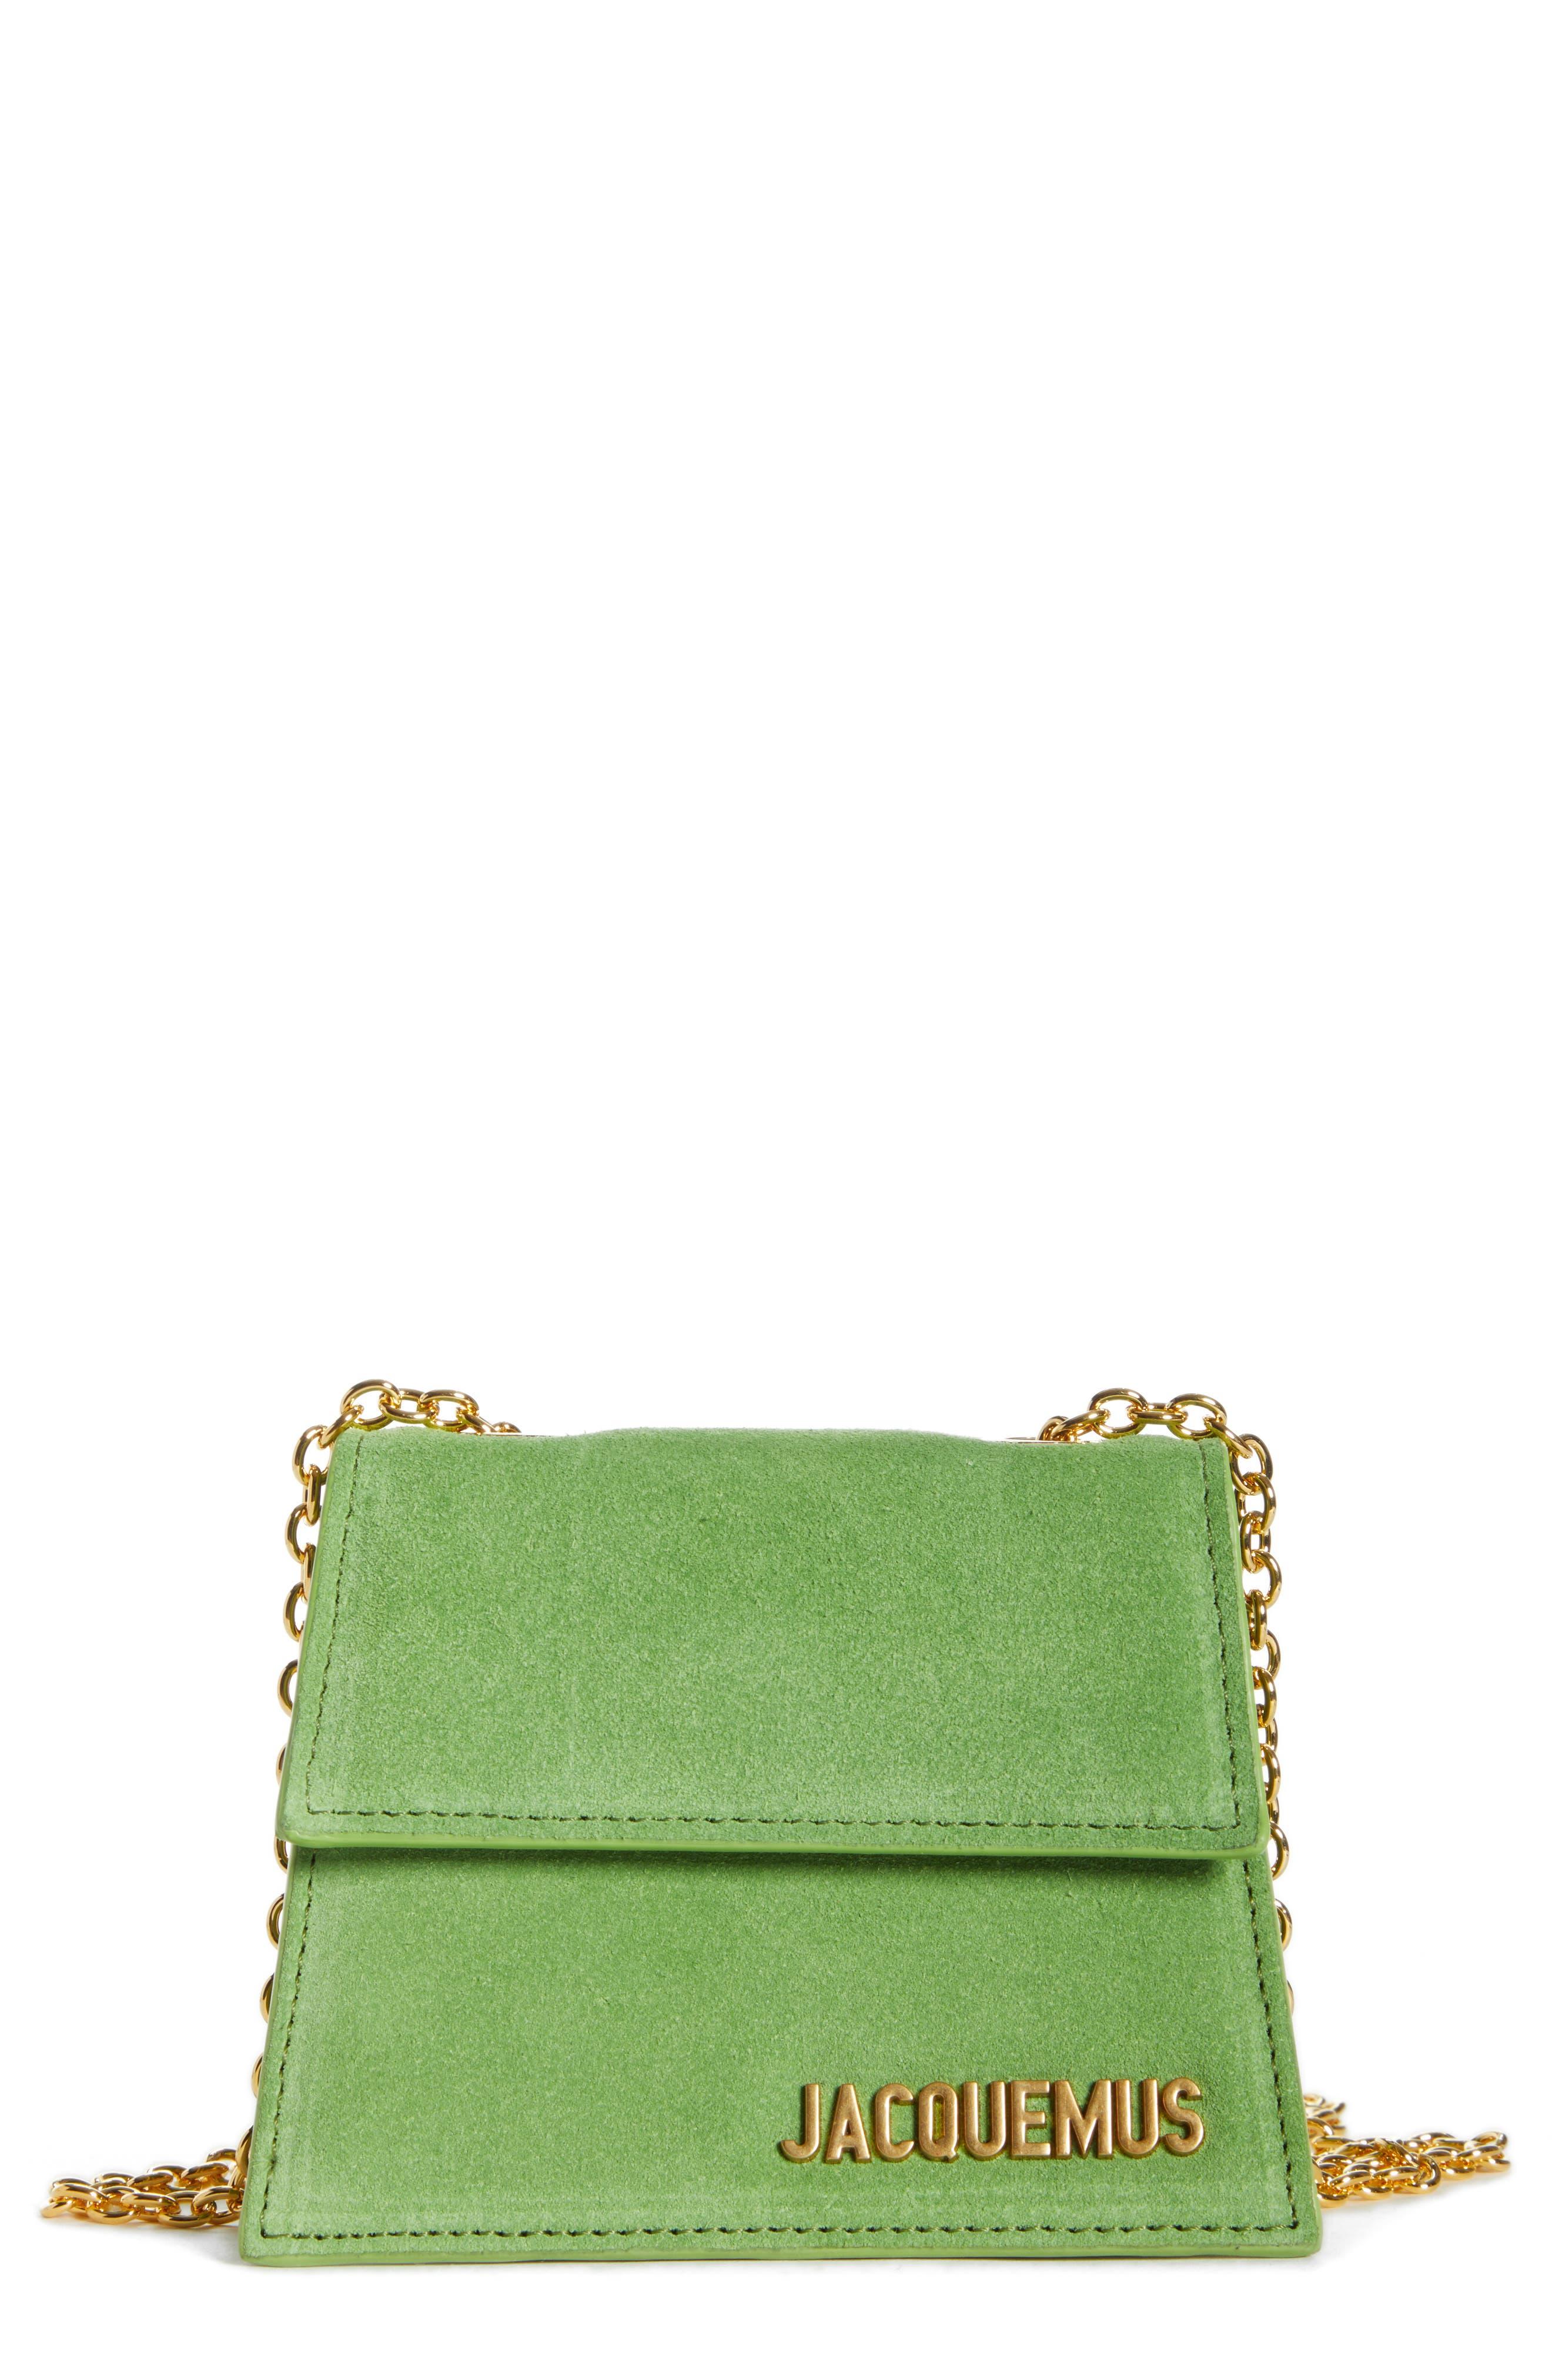 JACQUEMUS Le Piccolo Leather Crossbody Bag, Main, color, 300